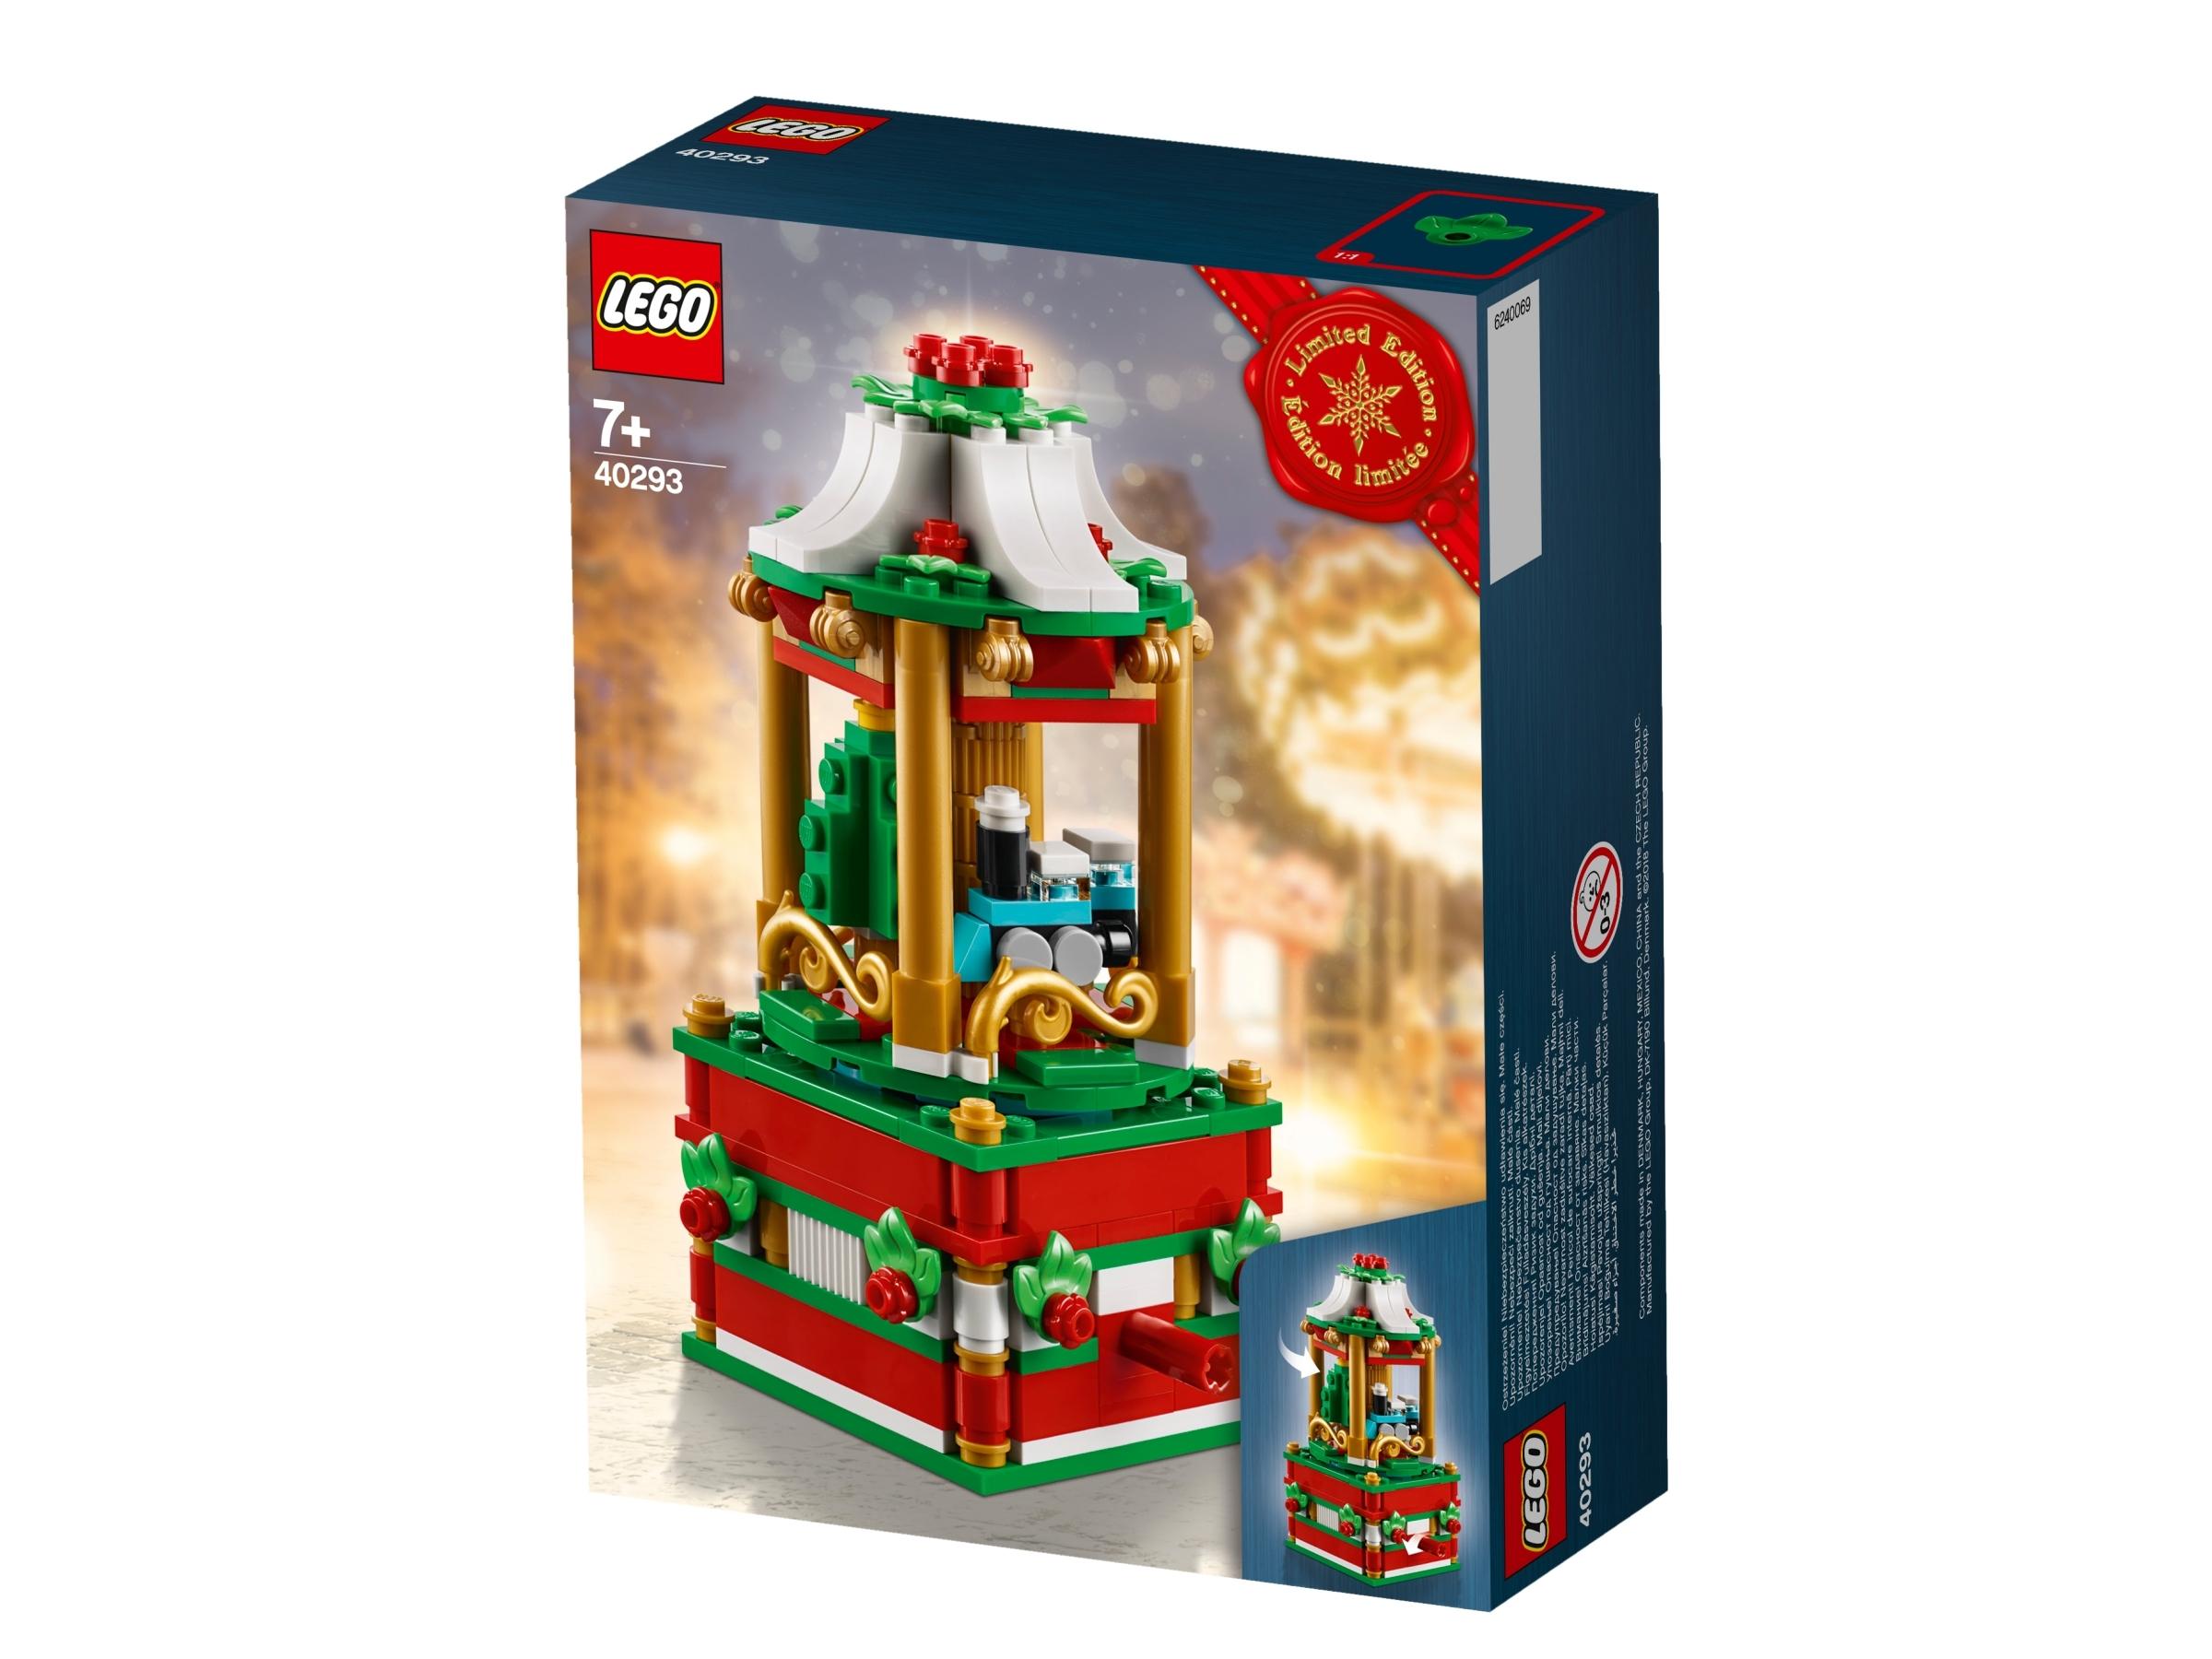 LEGO 40293 CHRISTMAS CAROUSEL SET BRAND NEW